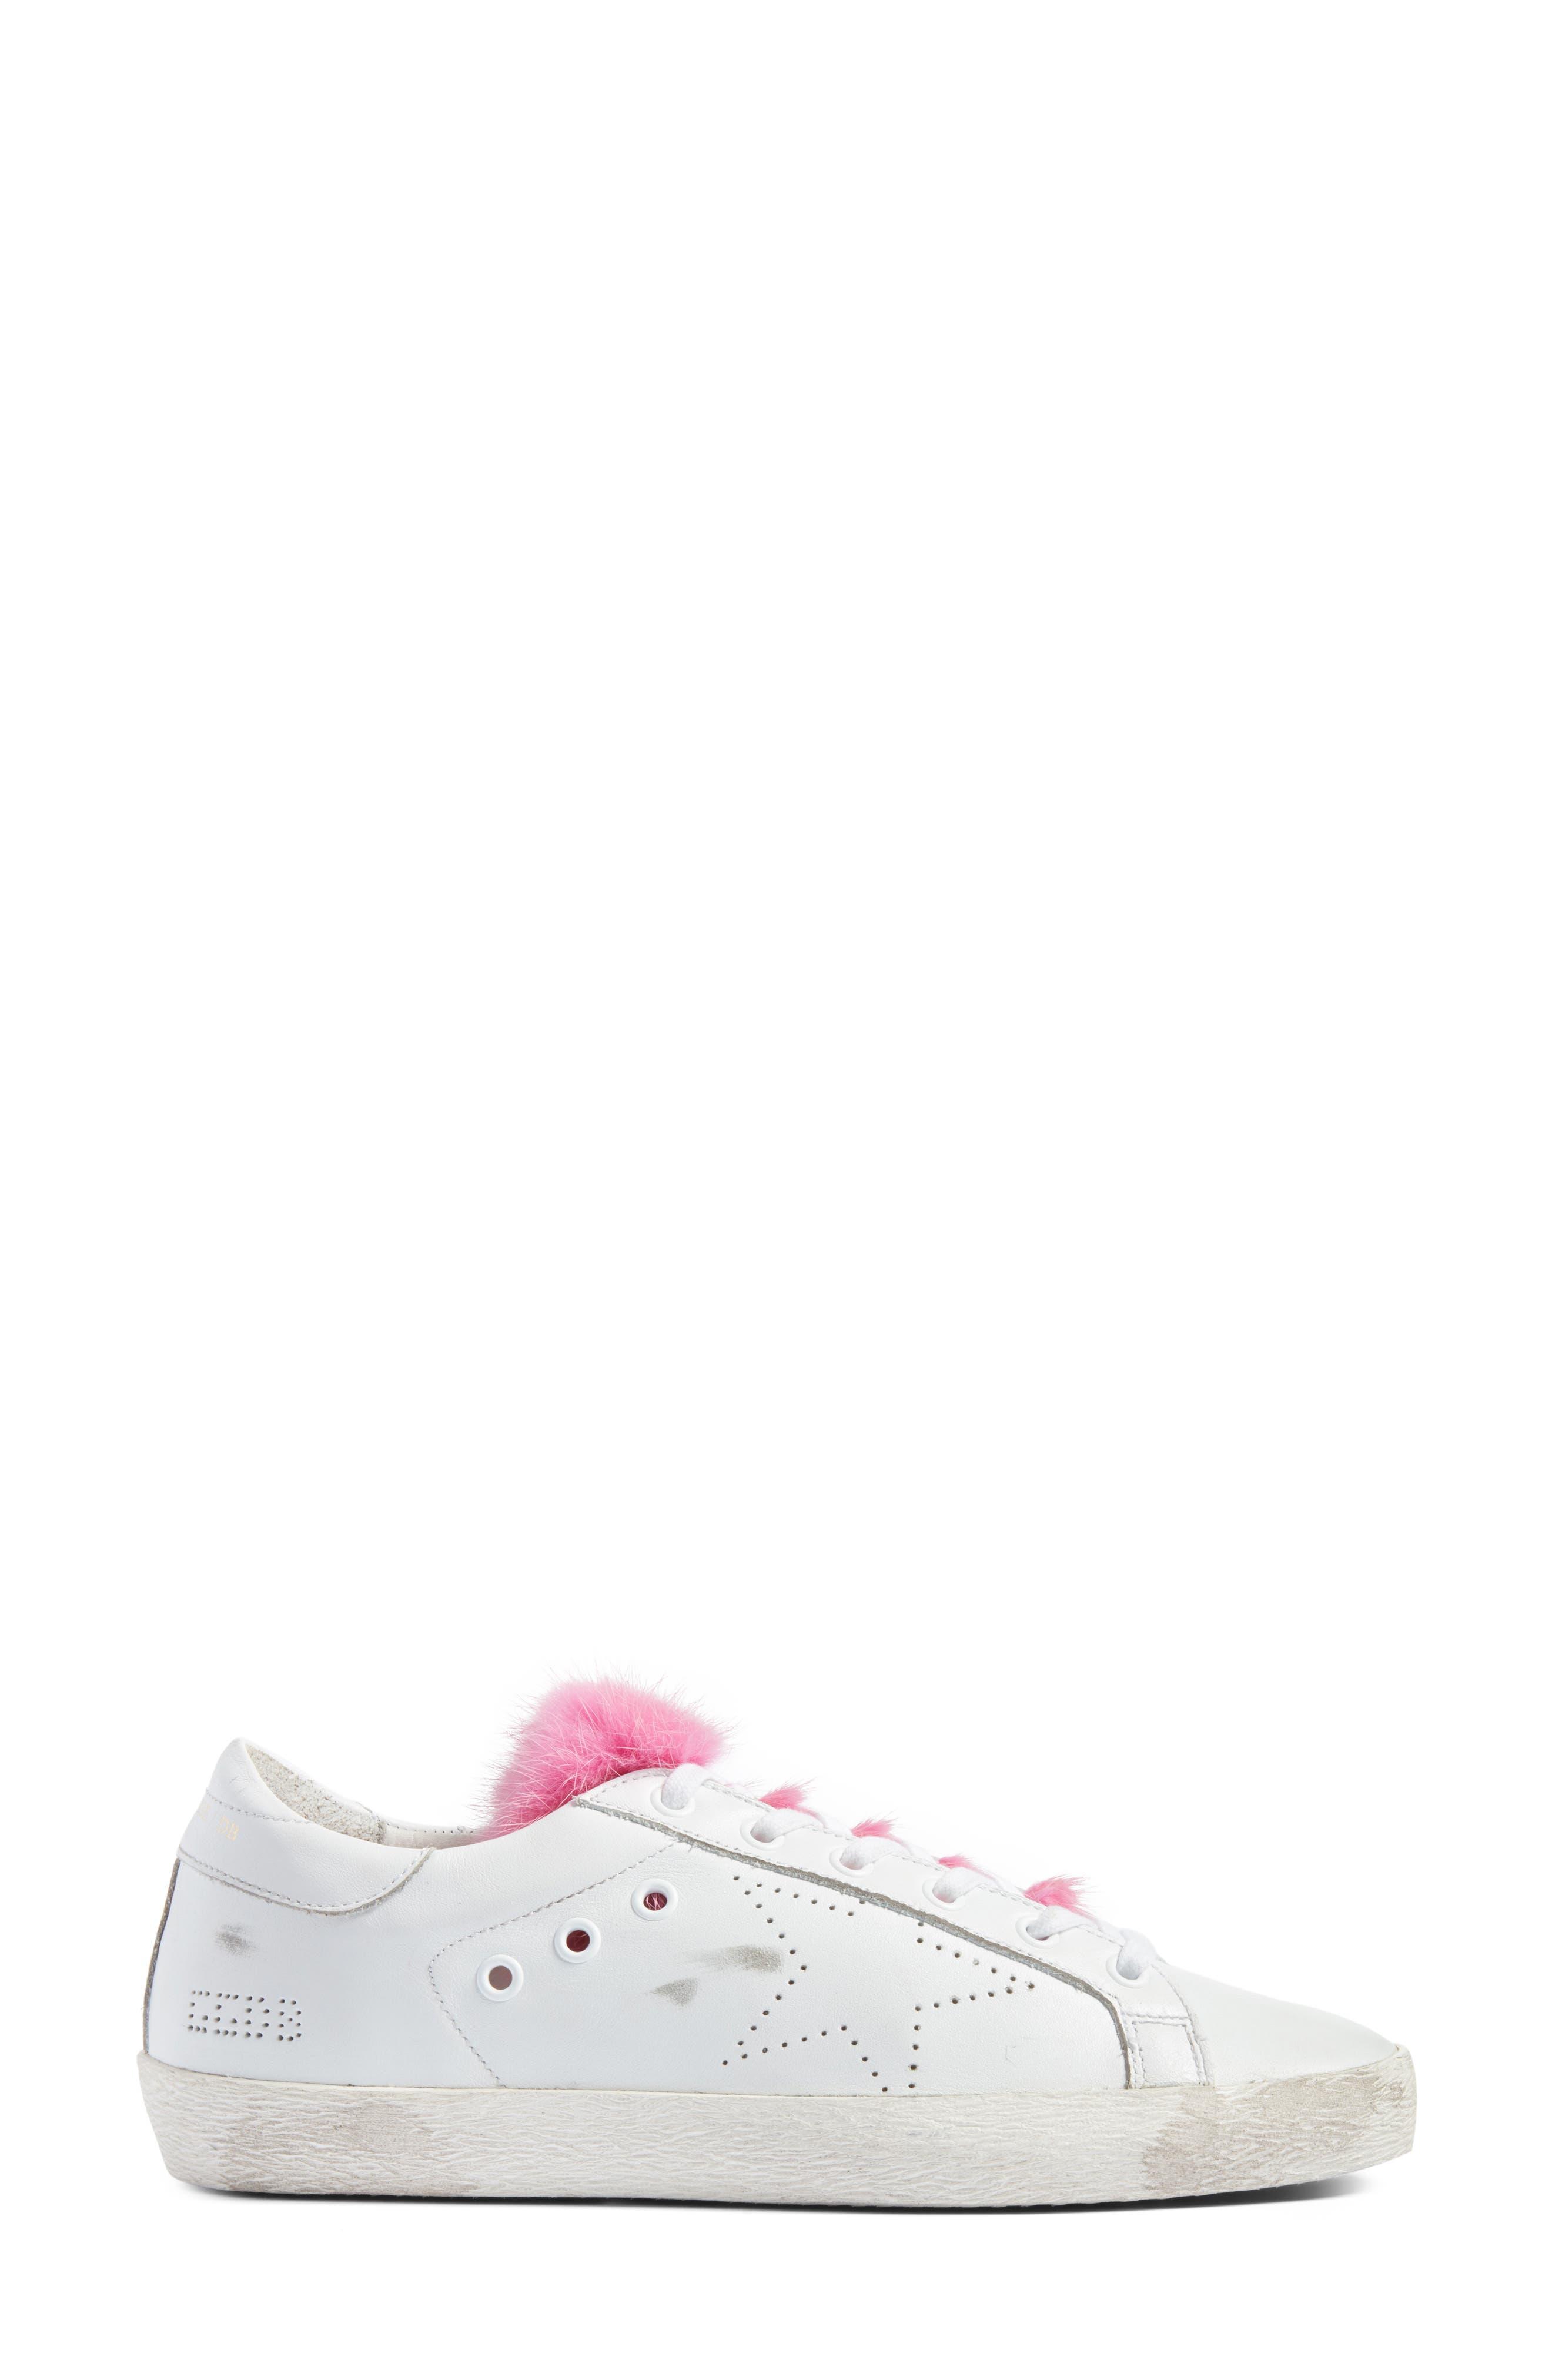 Superstar Genuine Mink Fur Sneaker,                             Alternate thumbnail 3, color,                             White Leather/ Pink